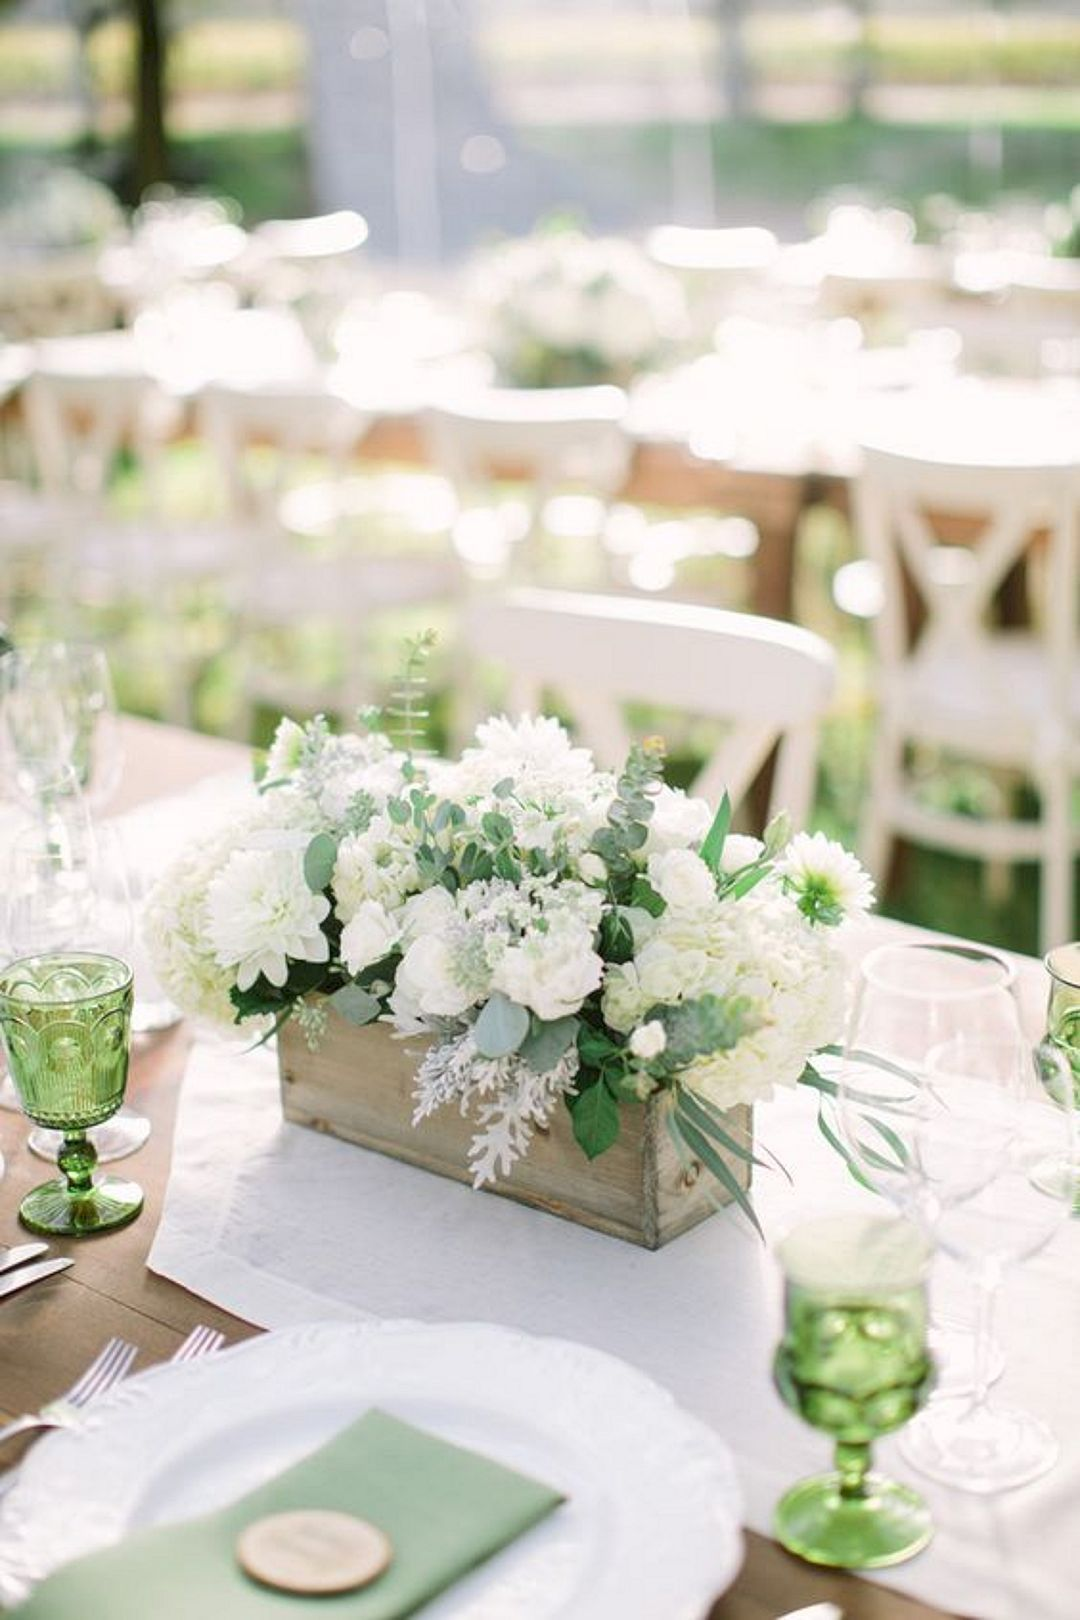 Funky Diy Wedding Table Centerpieces Sketch - The Wedding Ideas ...